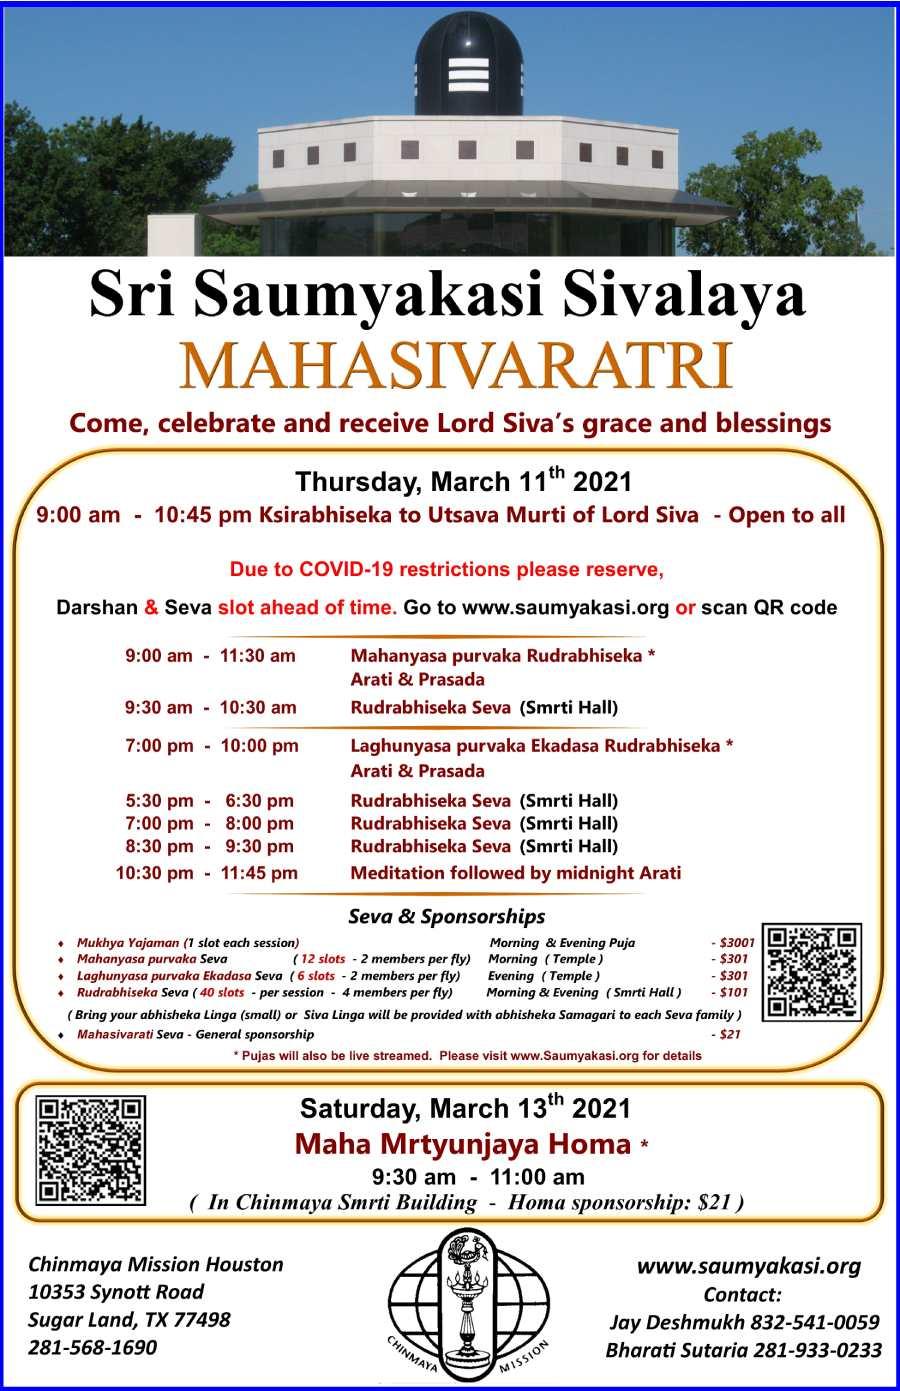 Saumyyakasi shivalaya Mahashivrathri